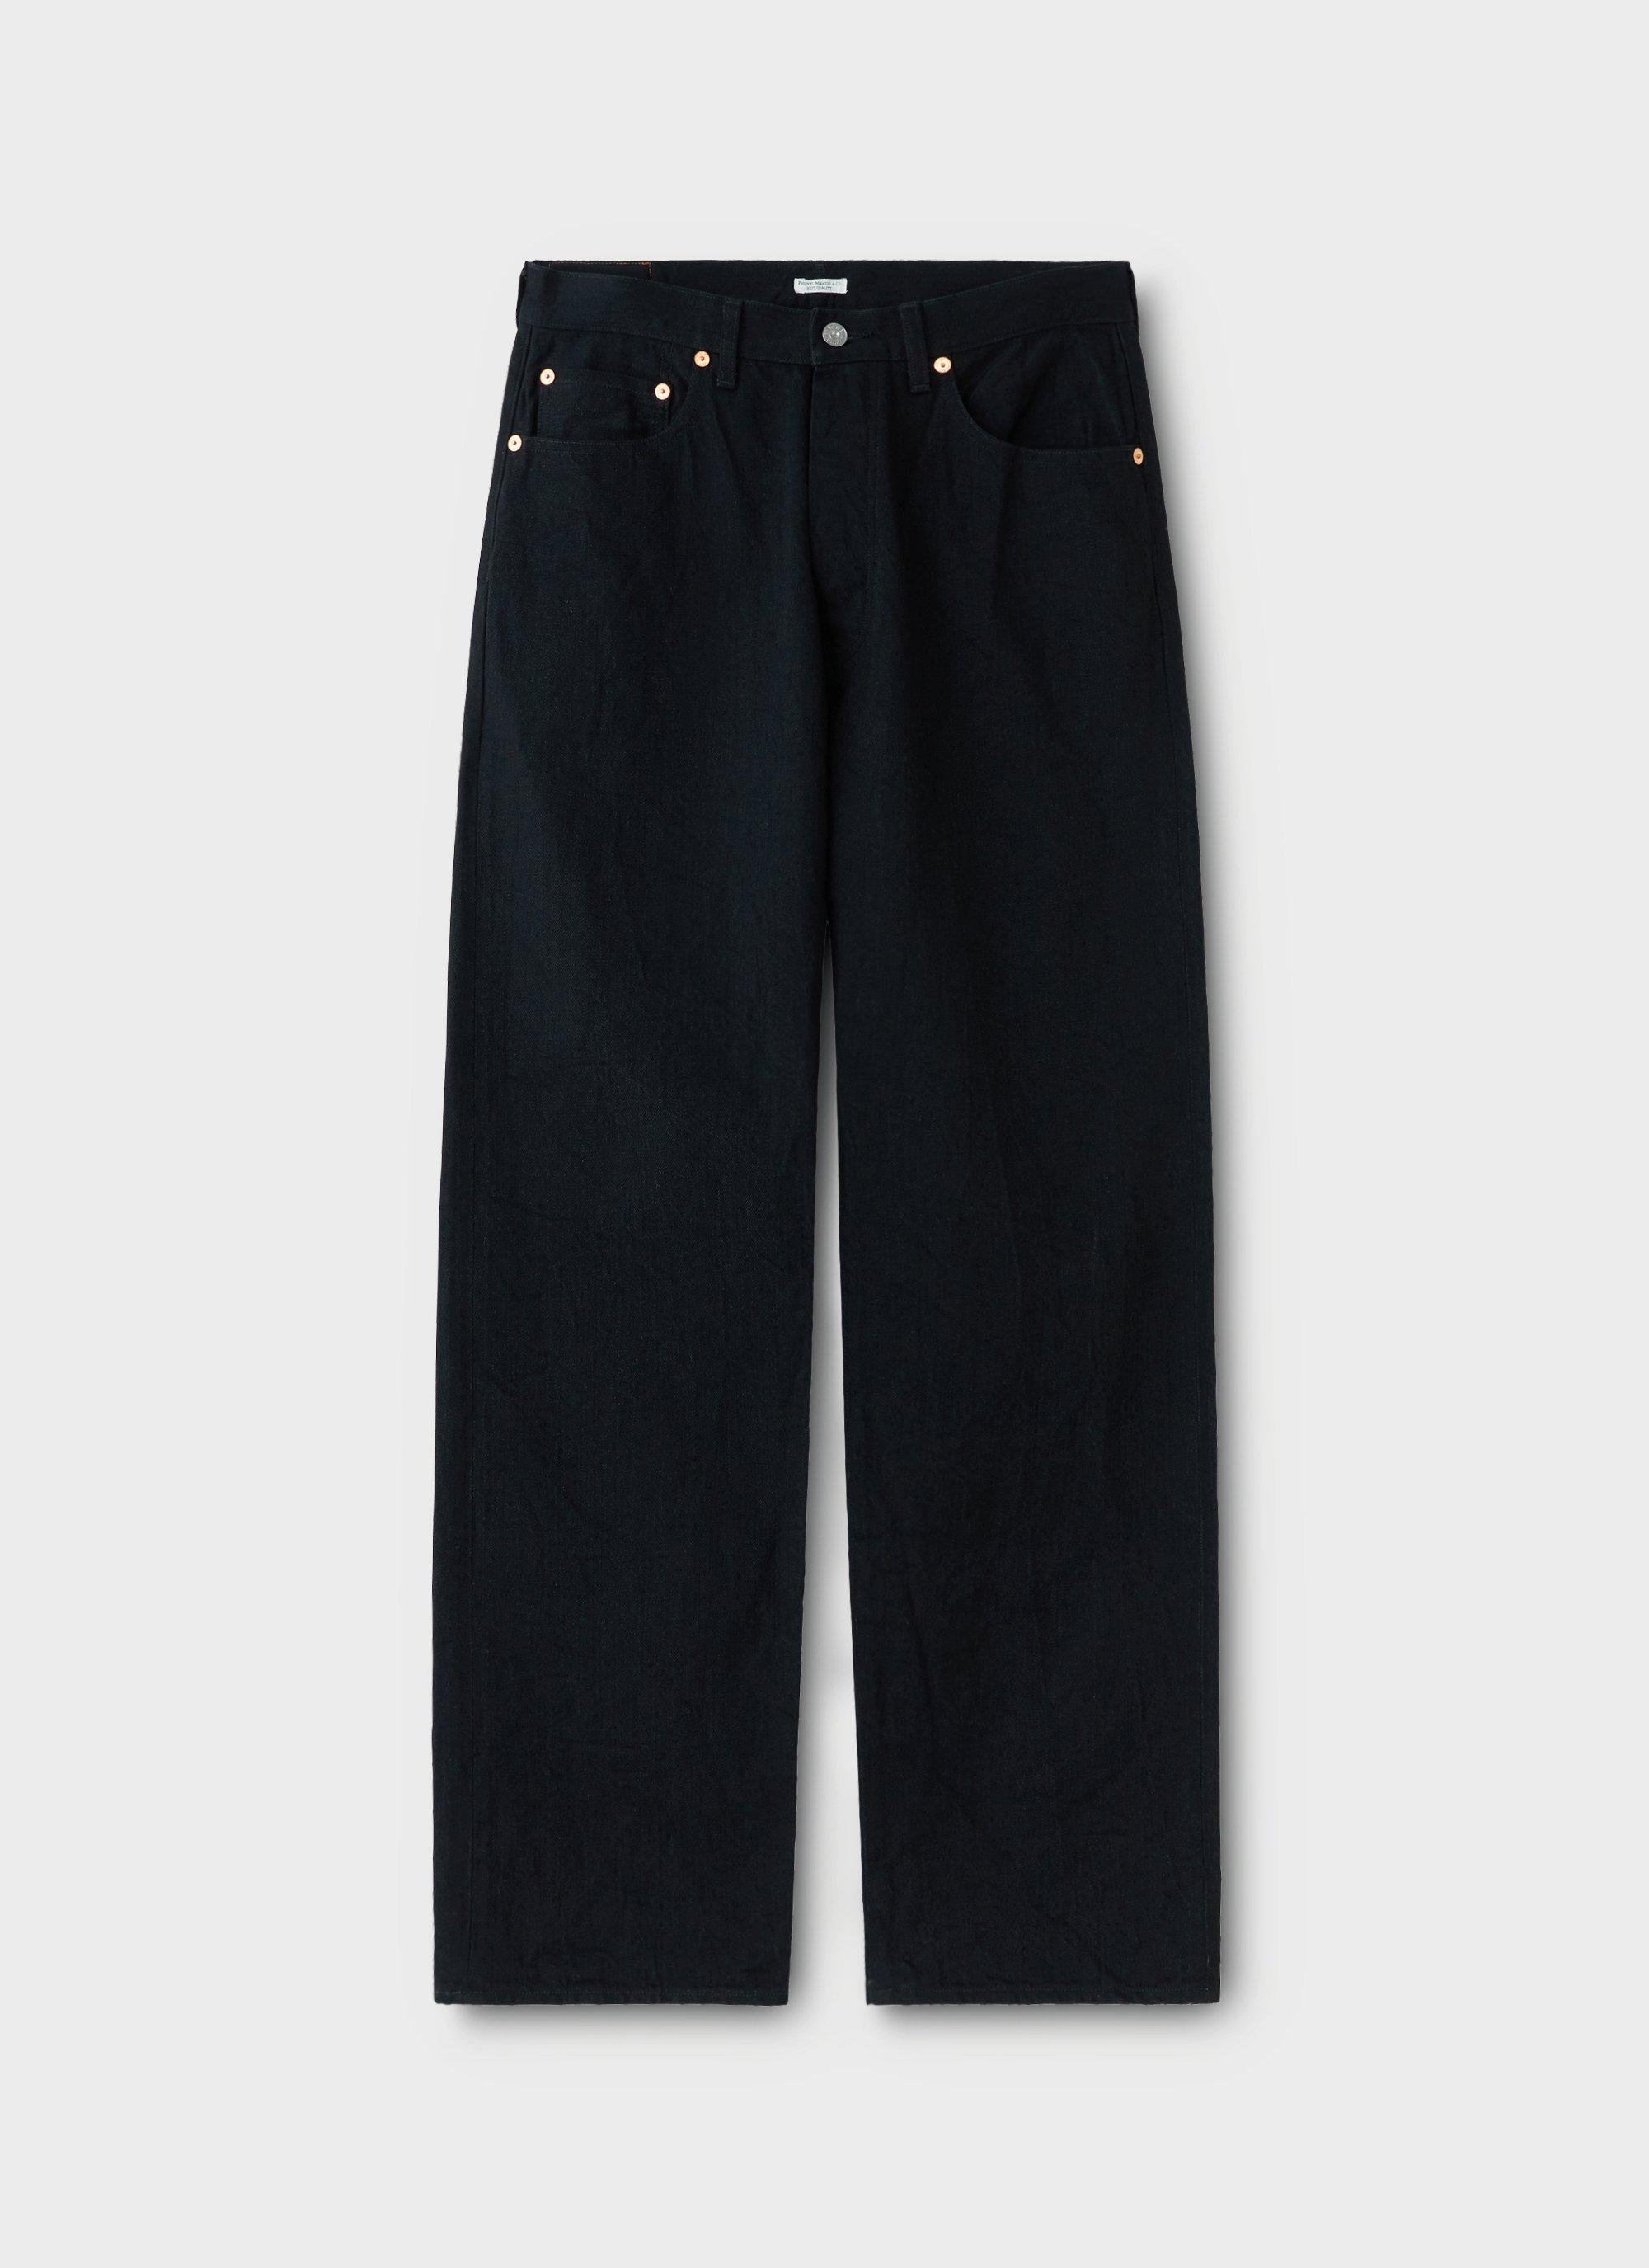 1940s Trousers, Mens Wide Leg Pants PHIGVEL MAKER  Co Classic Black Jean 301-Wide Denim - Black $355.00 AT vintagedancer.com